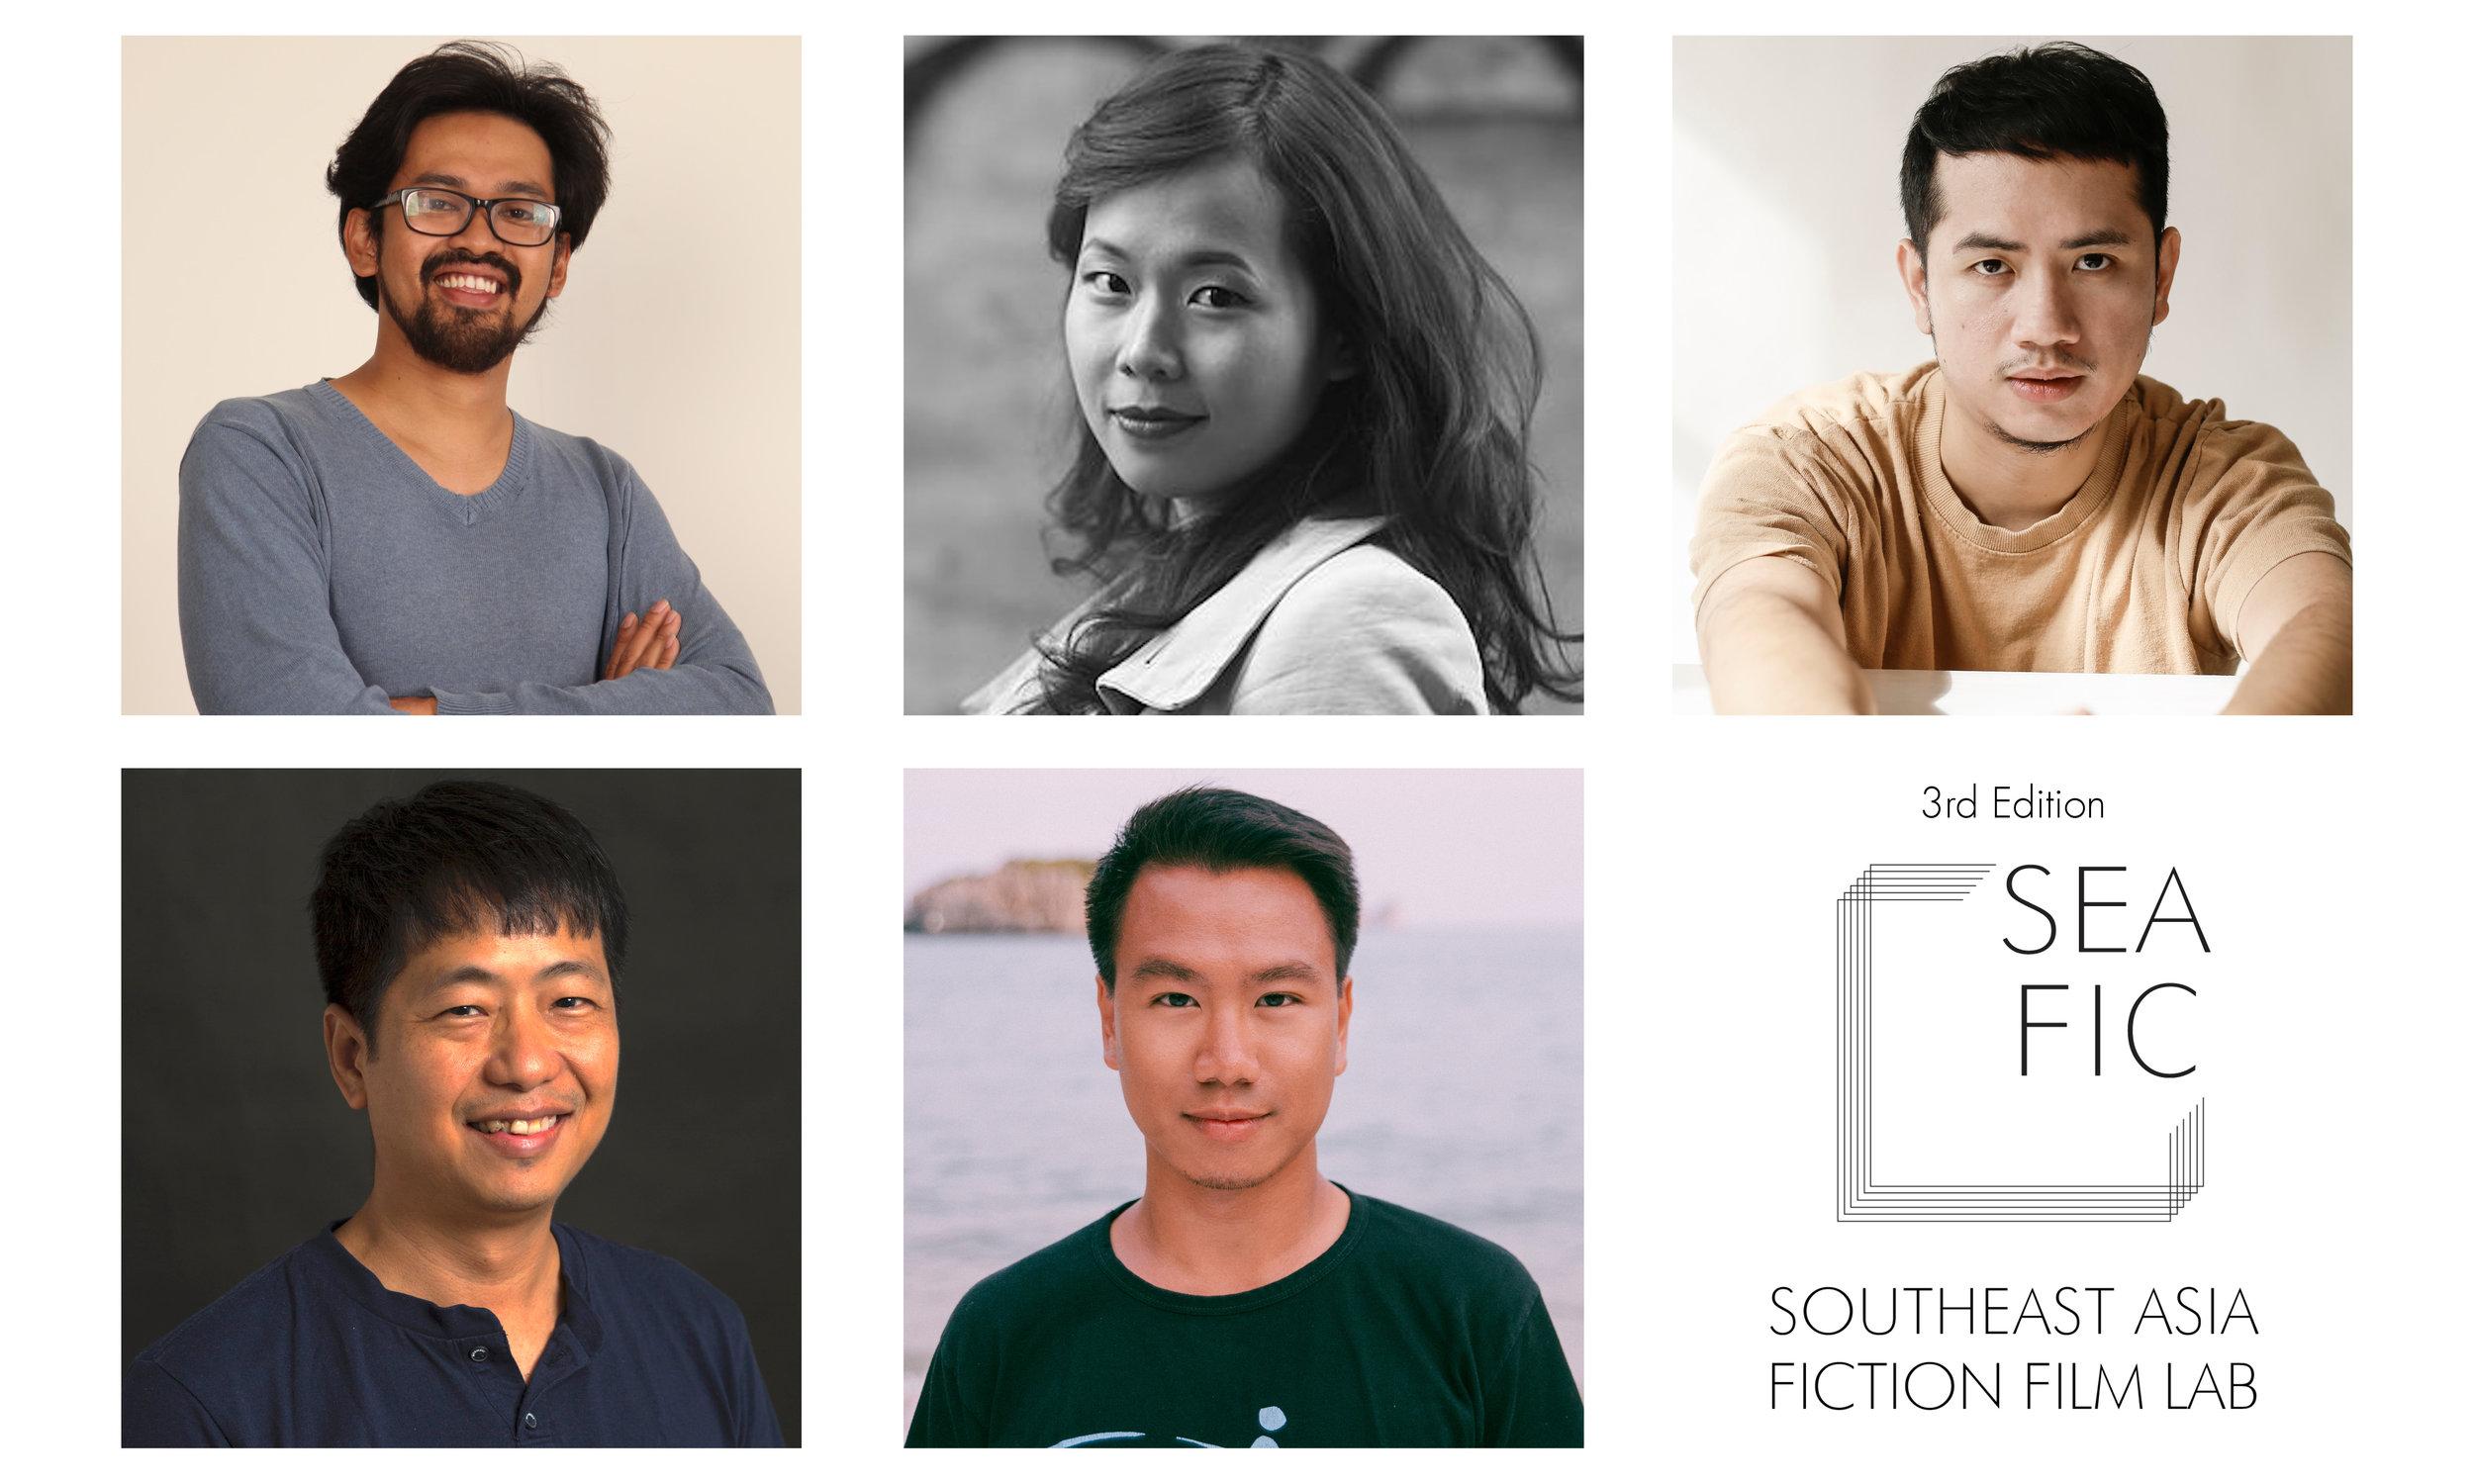 Top left: Makbul Mubarak, Top center: Ash Mayfair, Top right: Petersen Vargas, Bottom left: The Maw Naing, Bottom center: Nguyen Le Hoang Viet